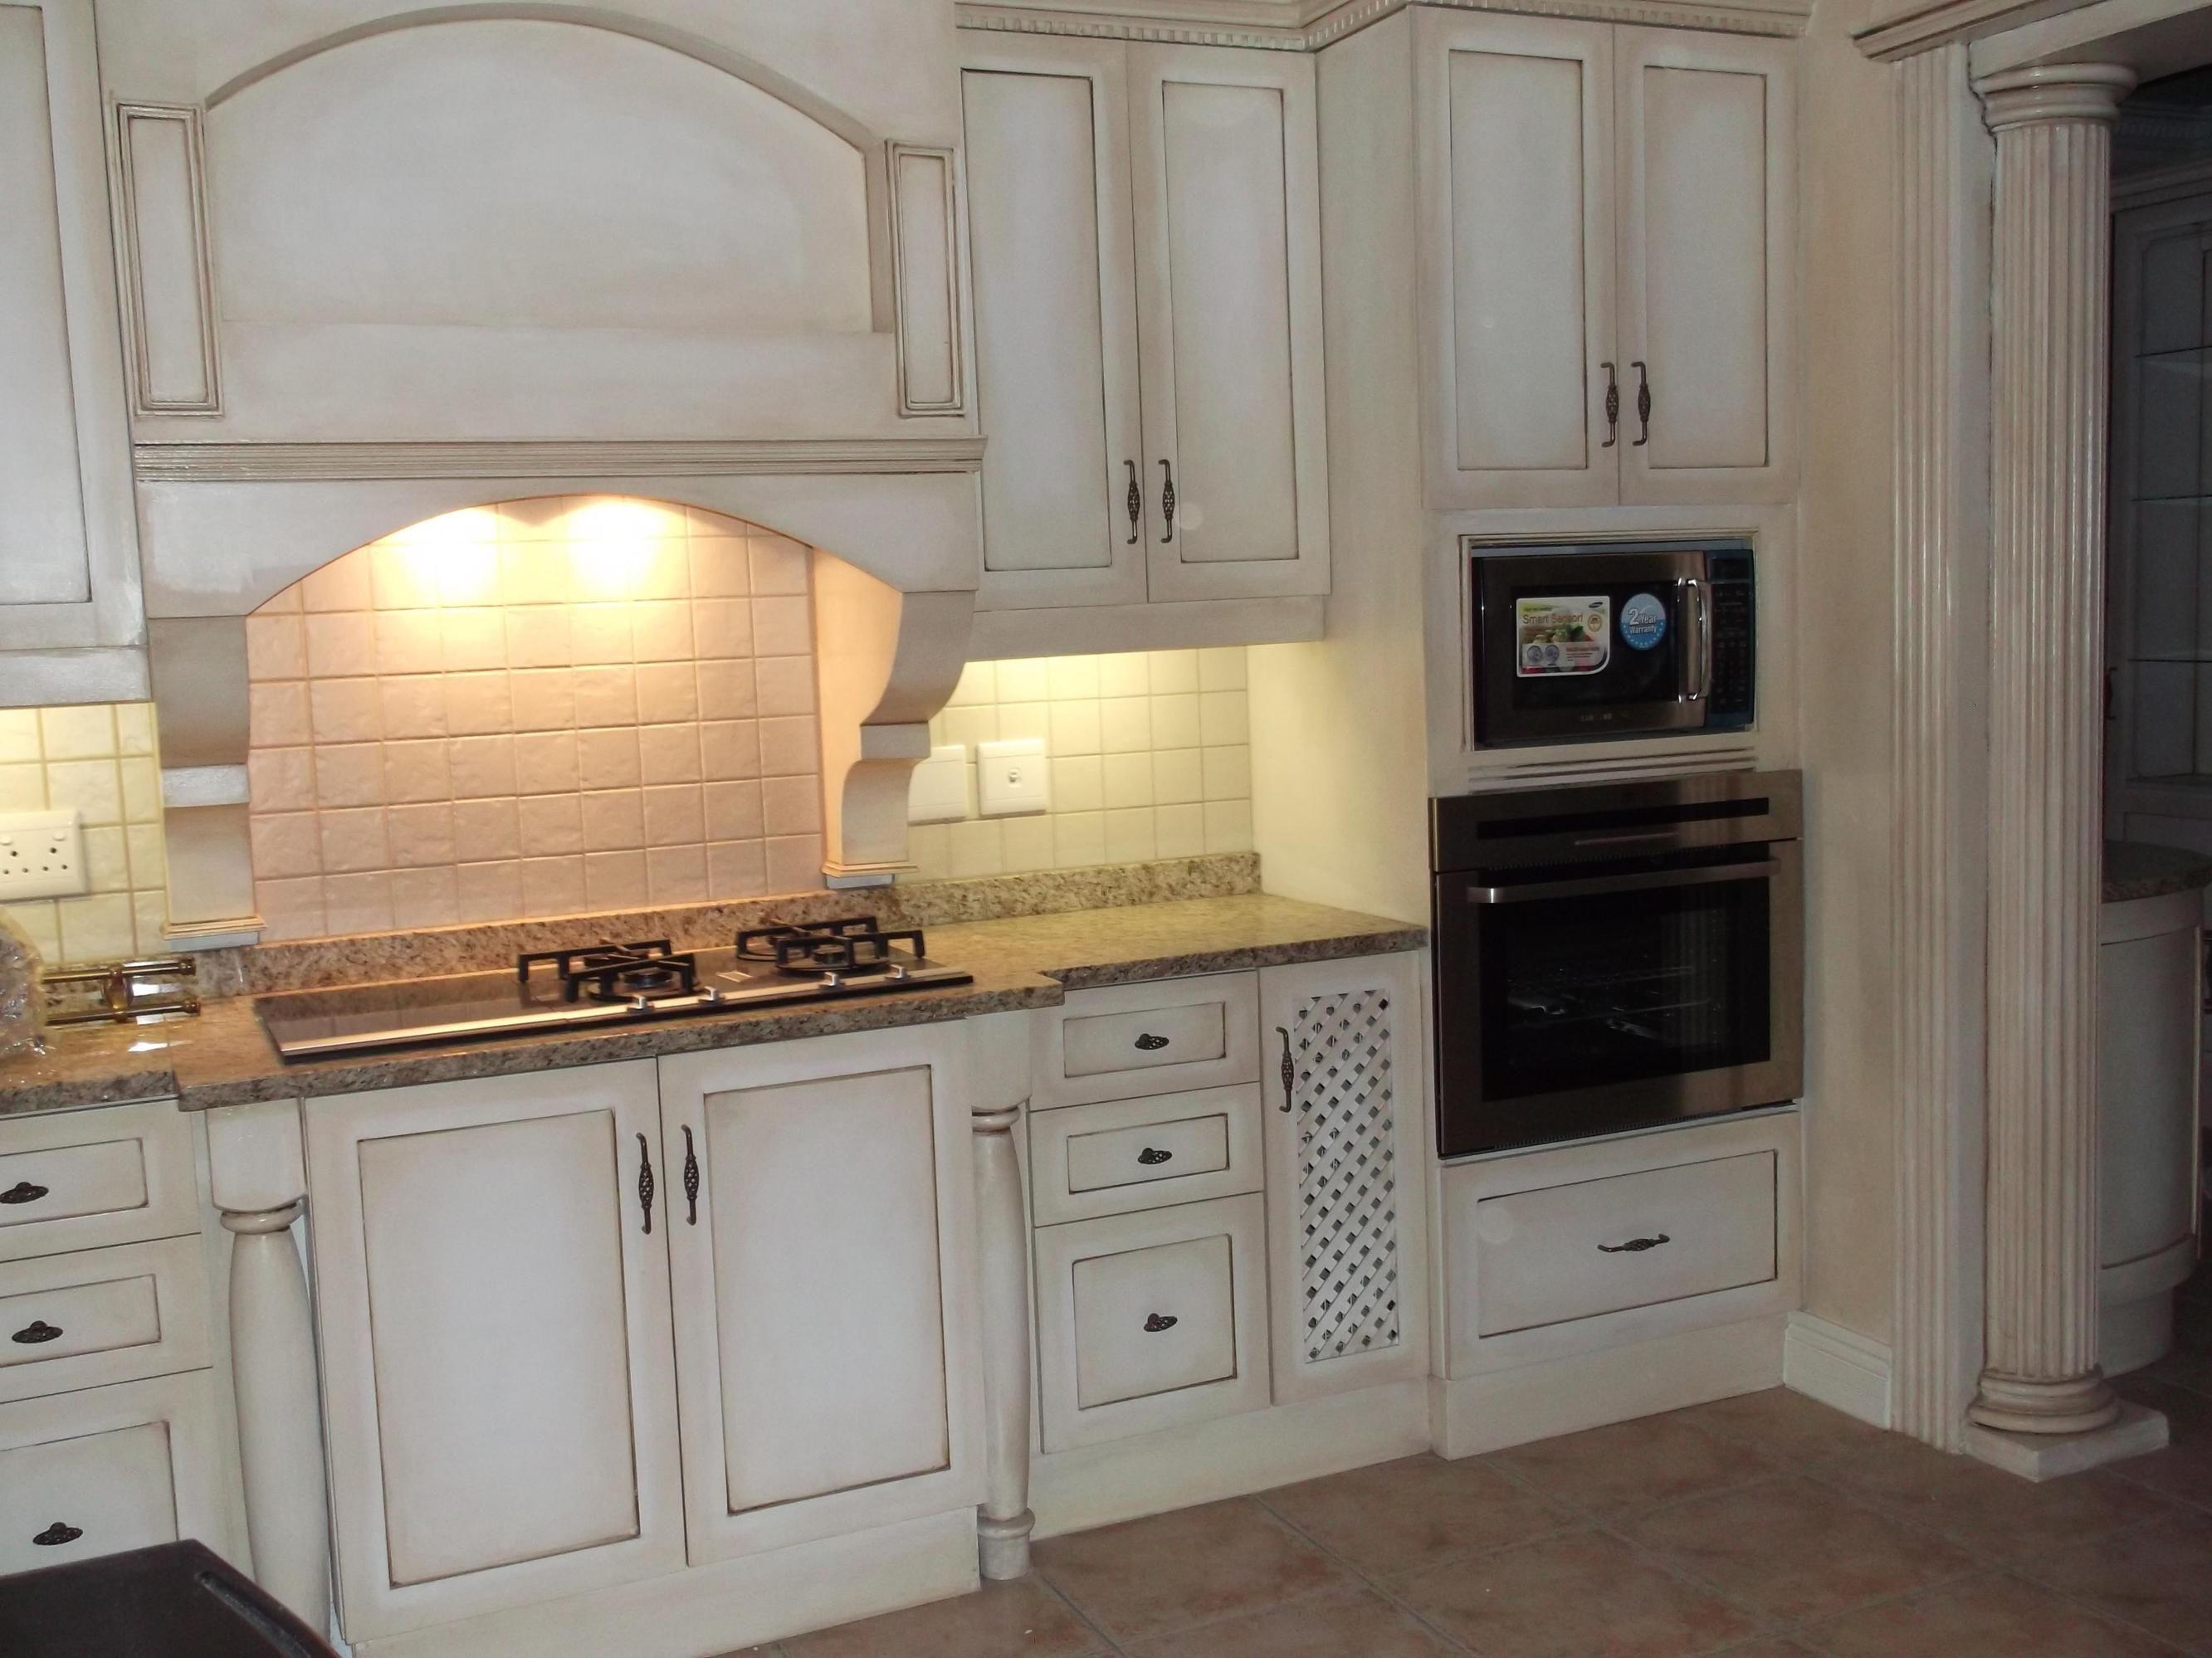 Shabby Chic Kitchen Cabinets Ideas 5